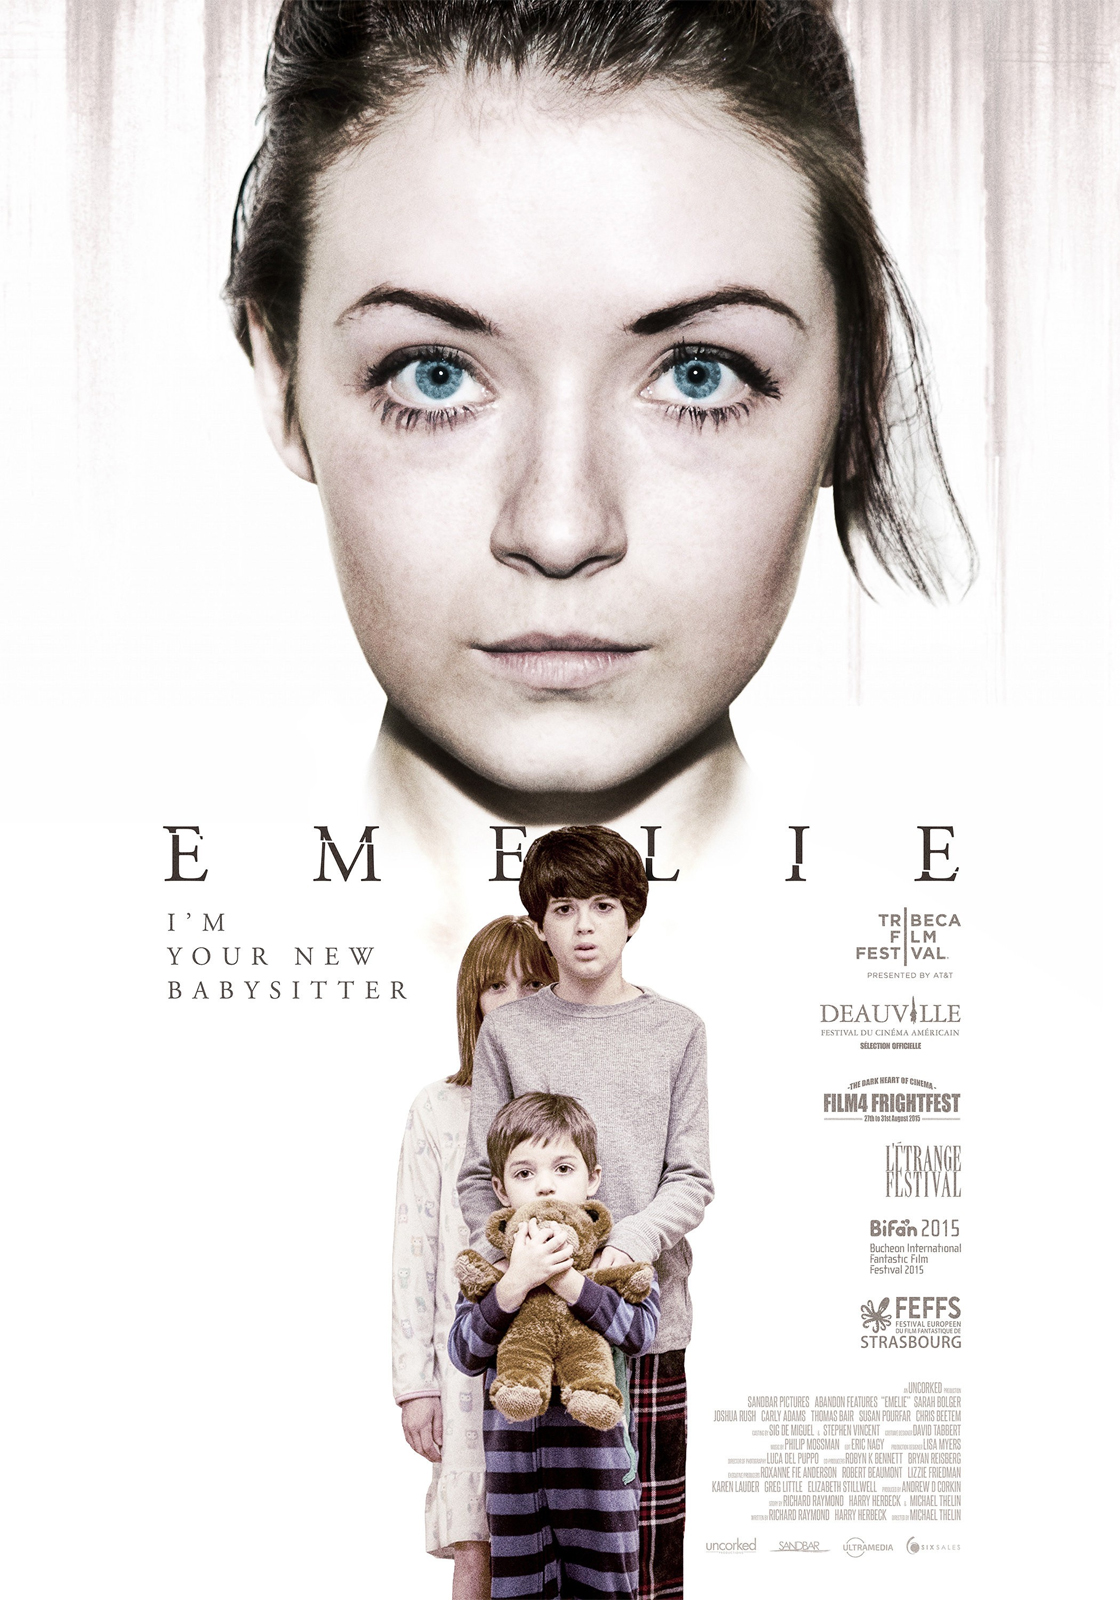 Emelie ddl